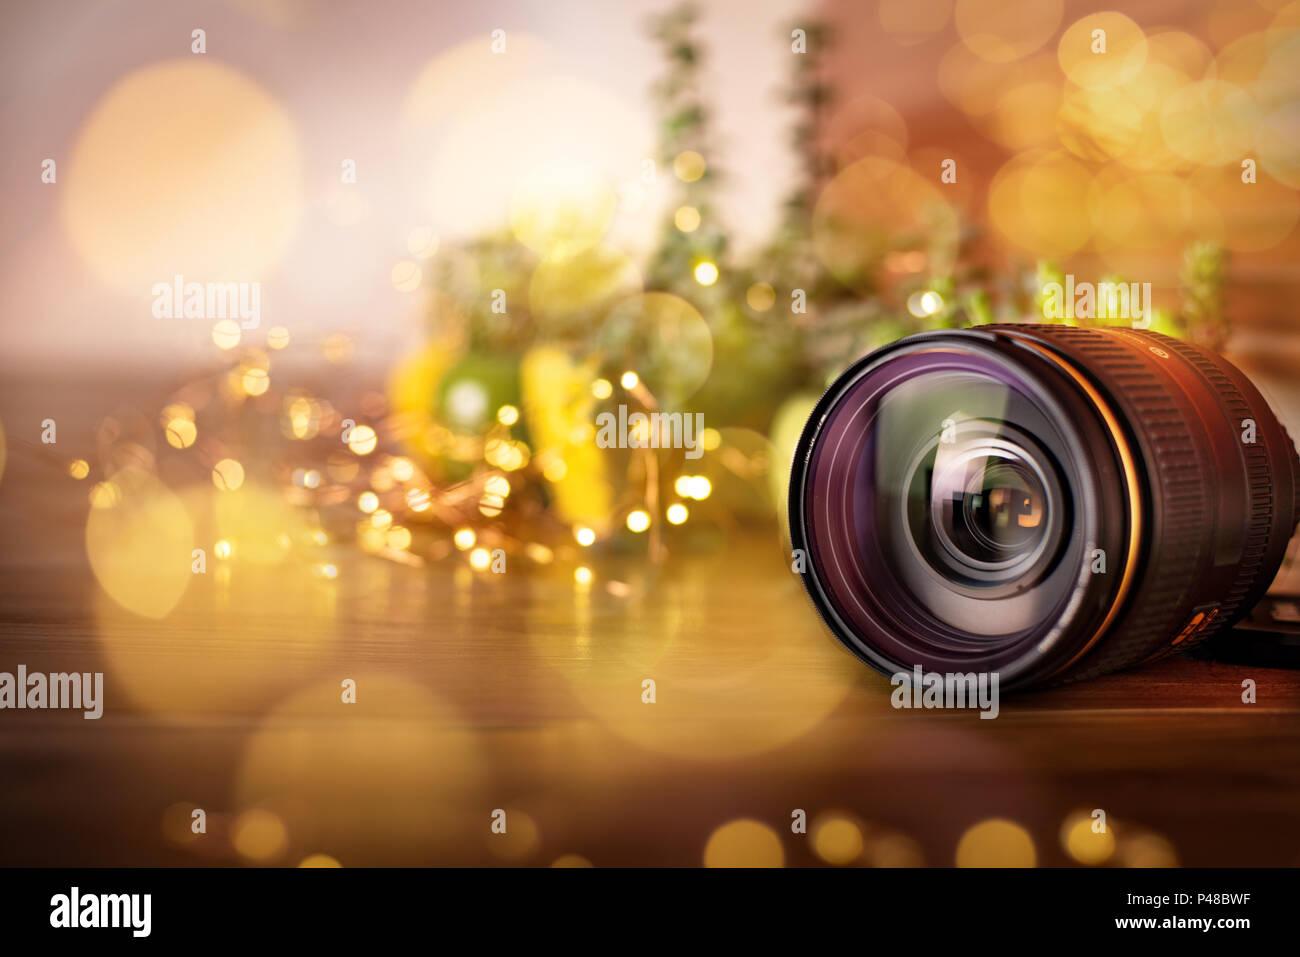 Nikon lens with light bokeh - Stock Image